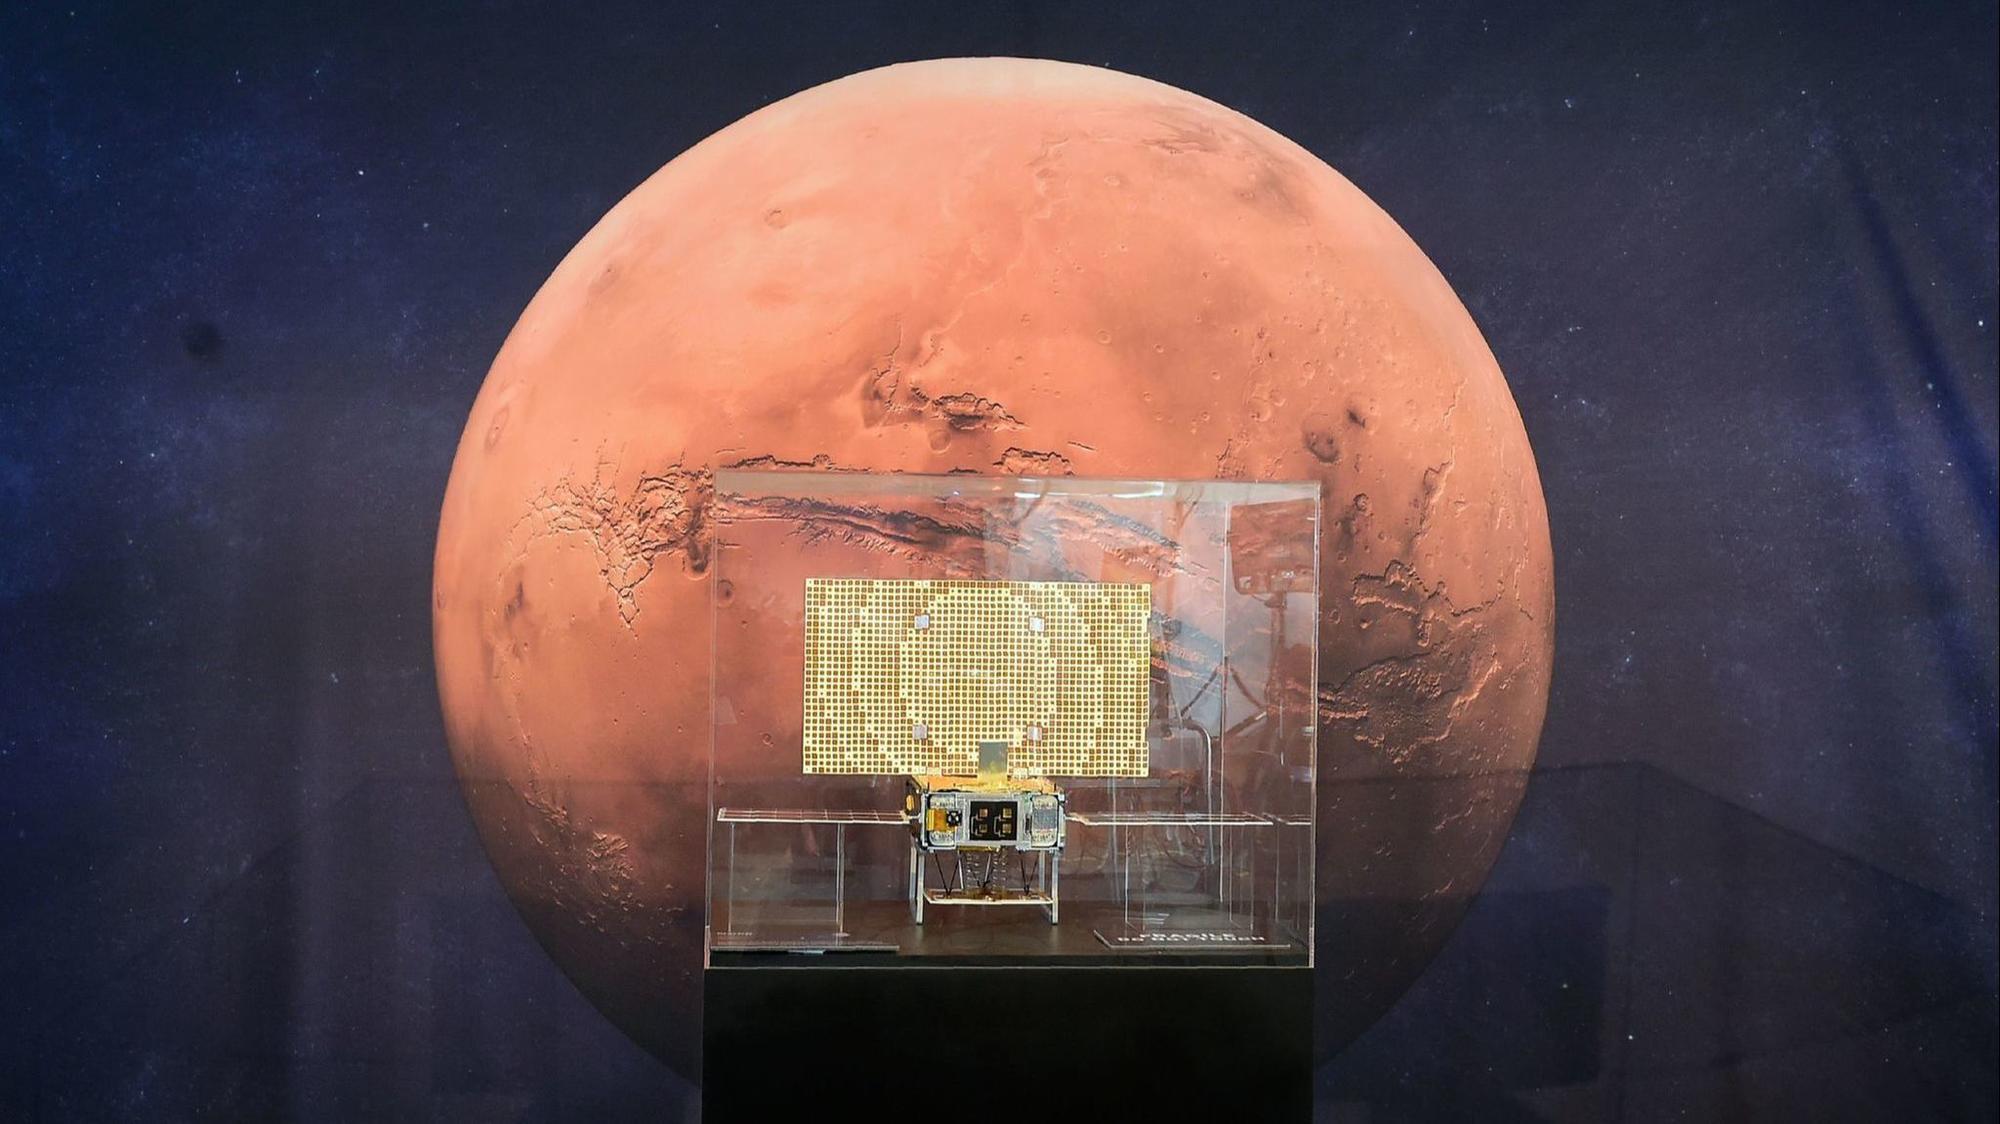 insight mars rover live stream - photo #19